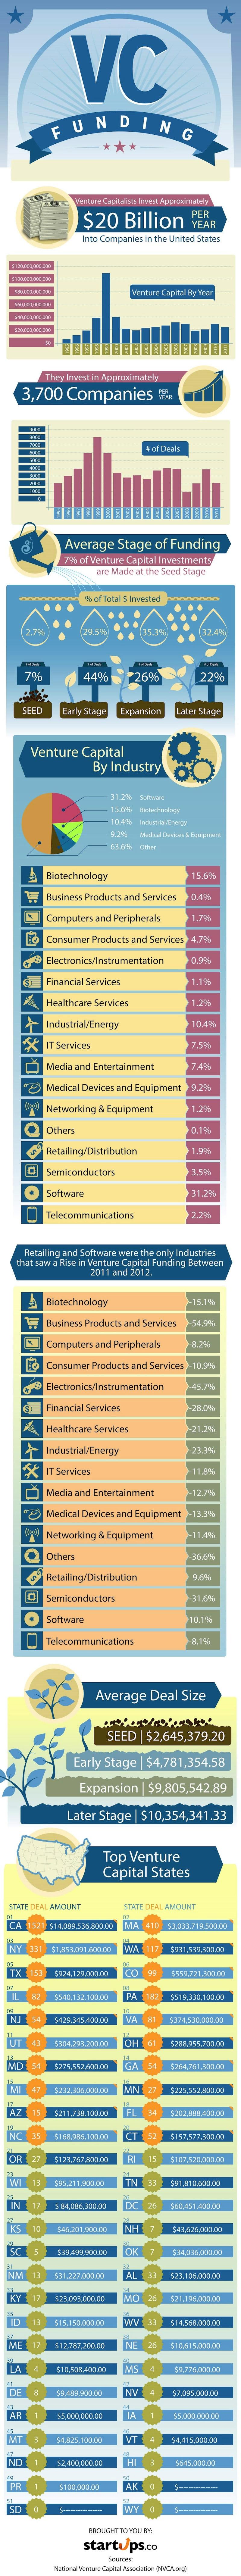 Venture Capital Trends Infographic